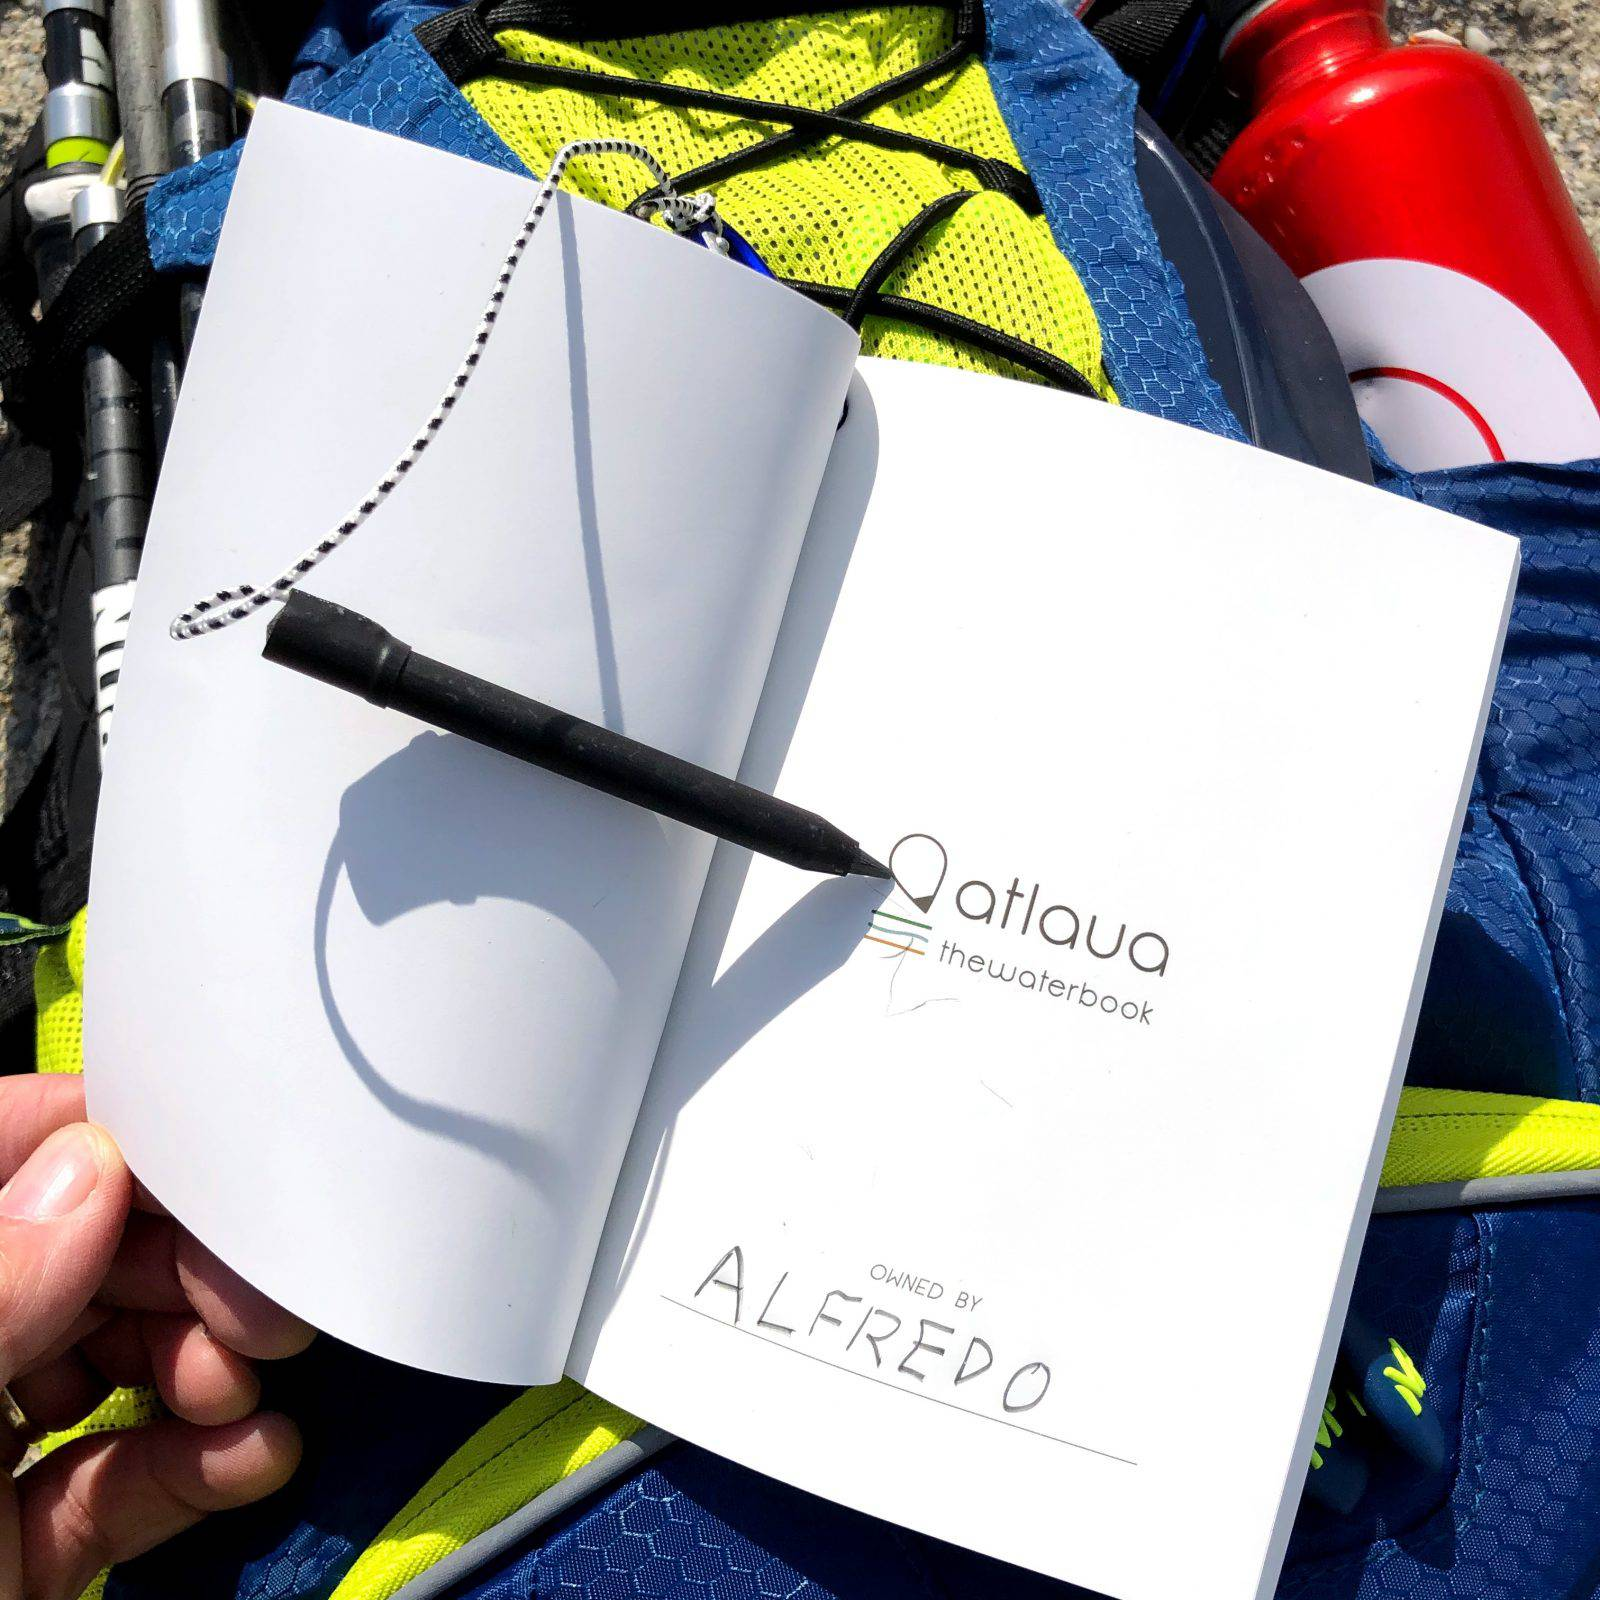 Il taccuino impermeabile Atlaua Waterproof notebook pronto per l'uso